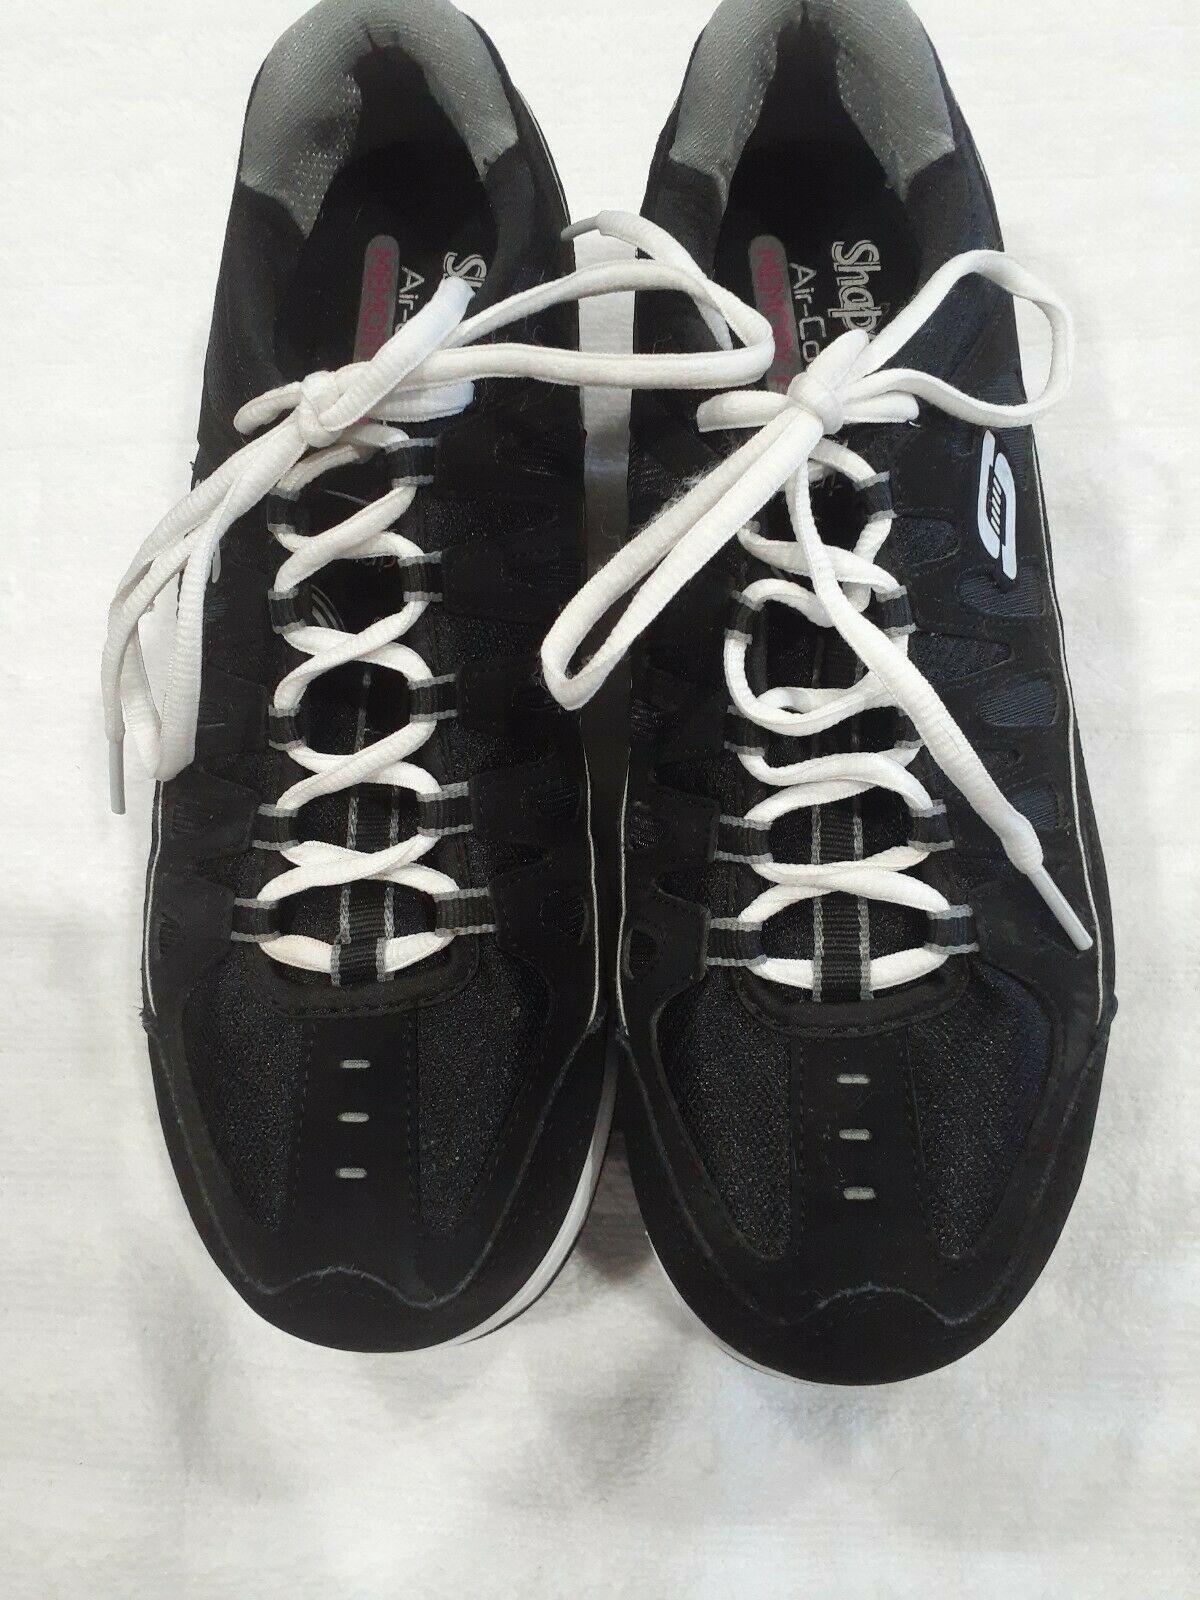 Womens Sz 9.5 M Skechers Shape-Ups Comfort Stride Shoes Sneakers Black & Silver image 9